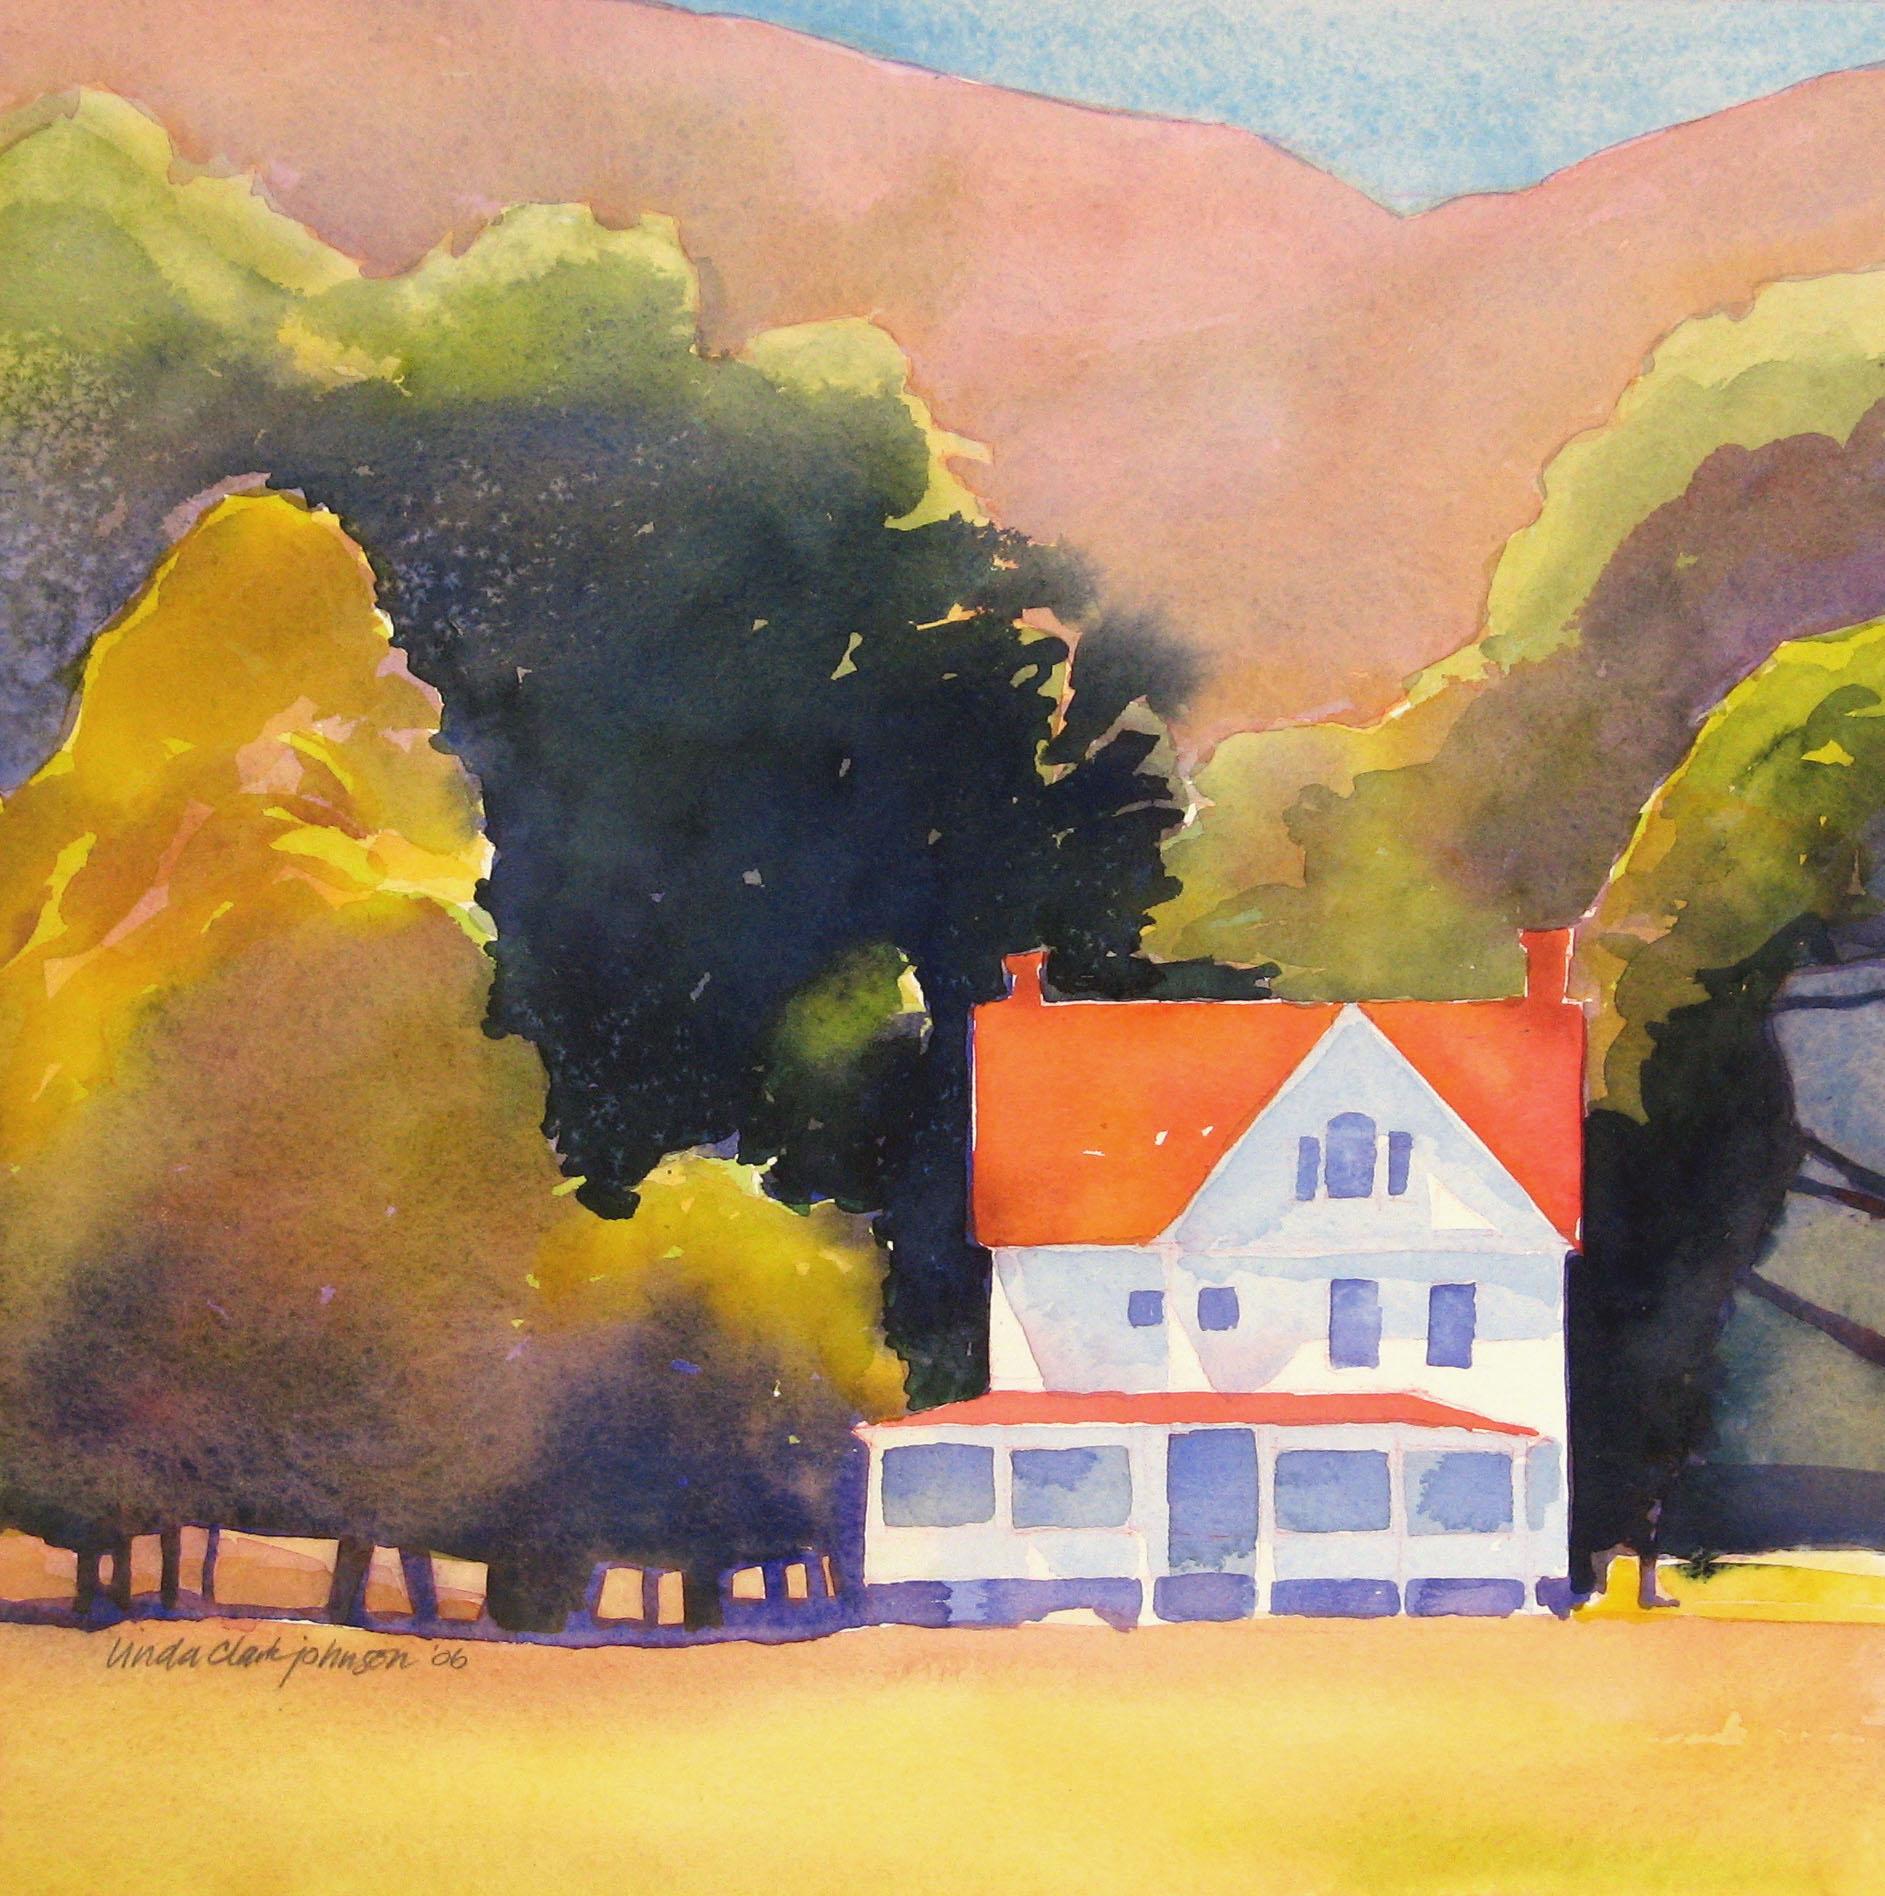 Lonesome Farmhouse  archival print  14 x 14 image  $100